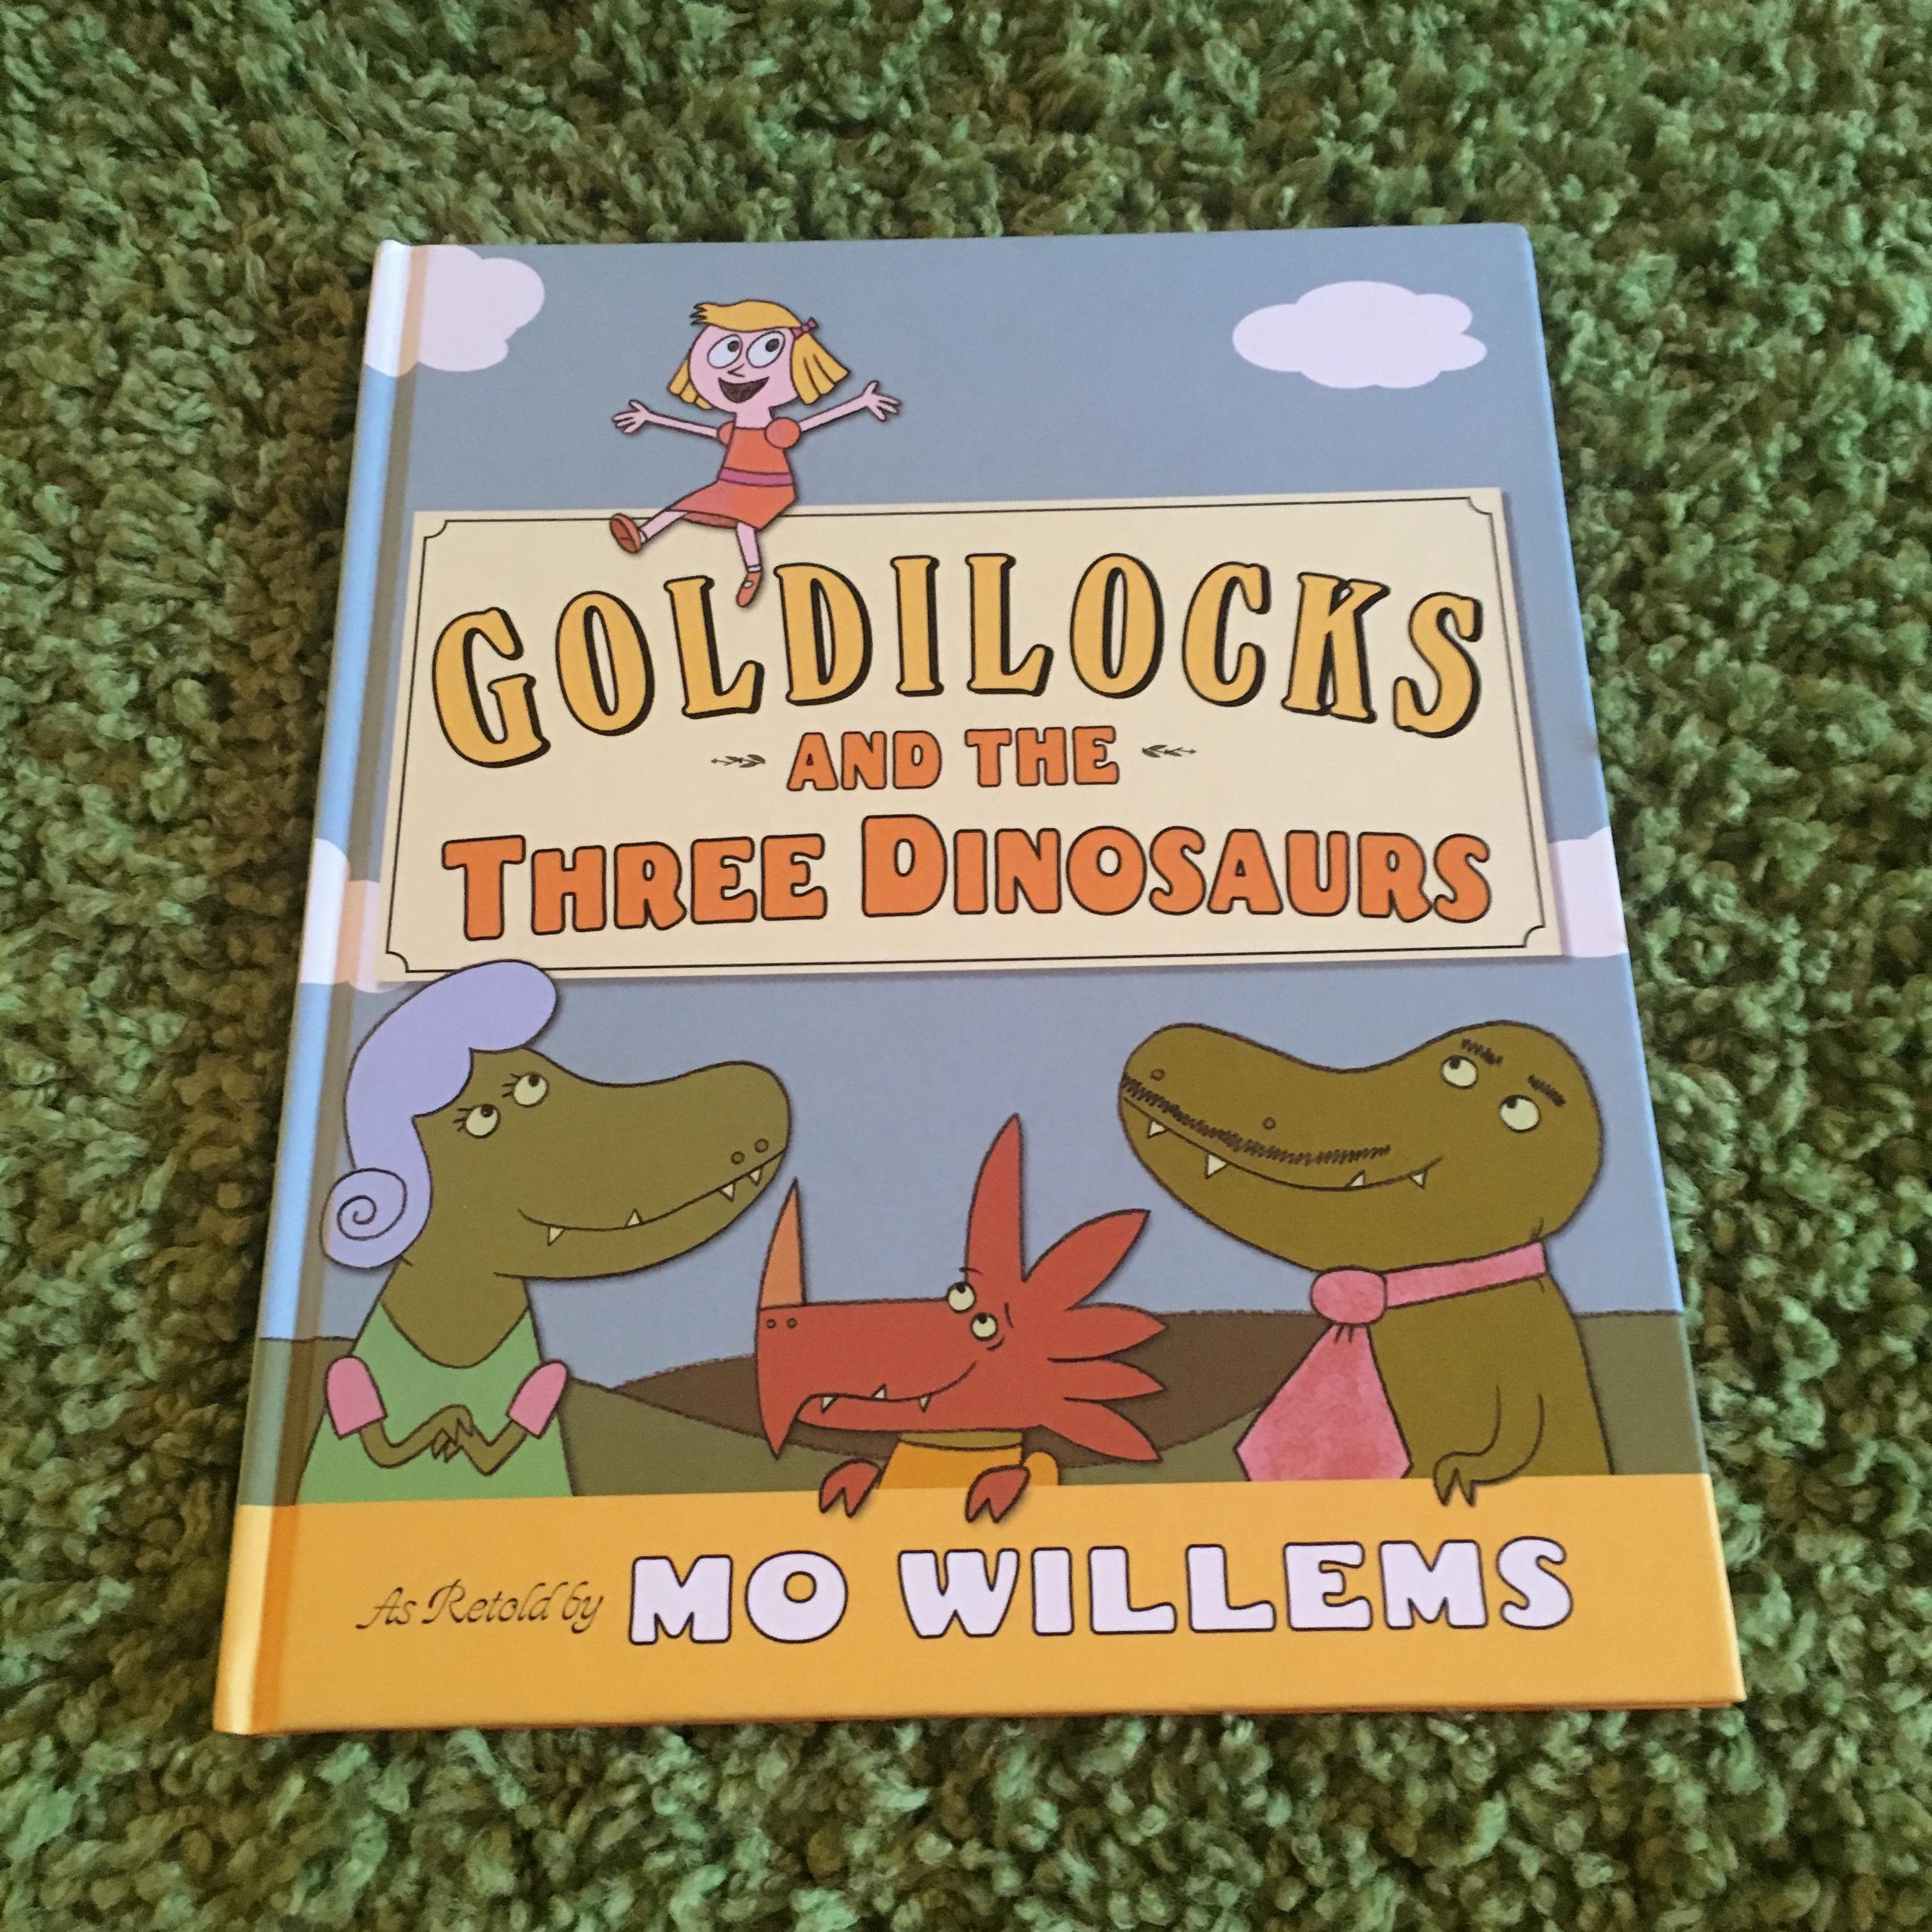 Wisdom From Goldilocks And The Three Dinosaurs